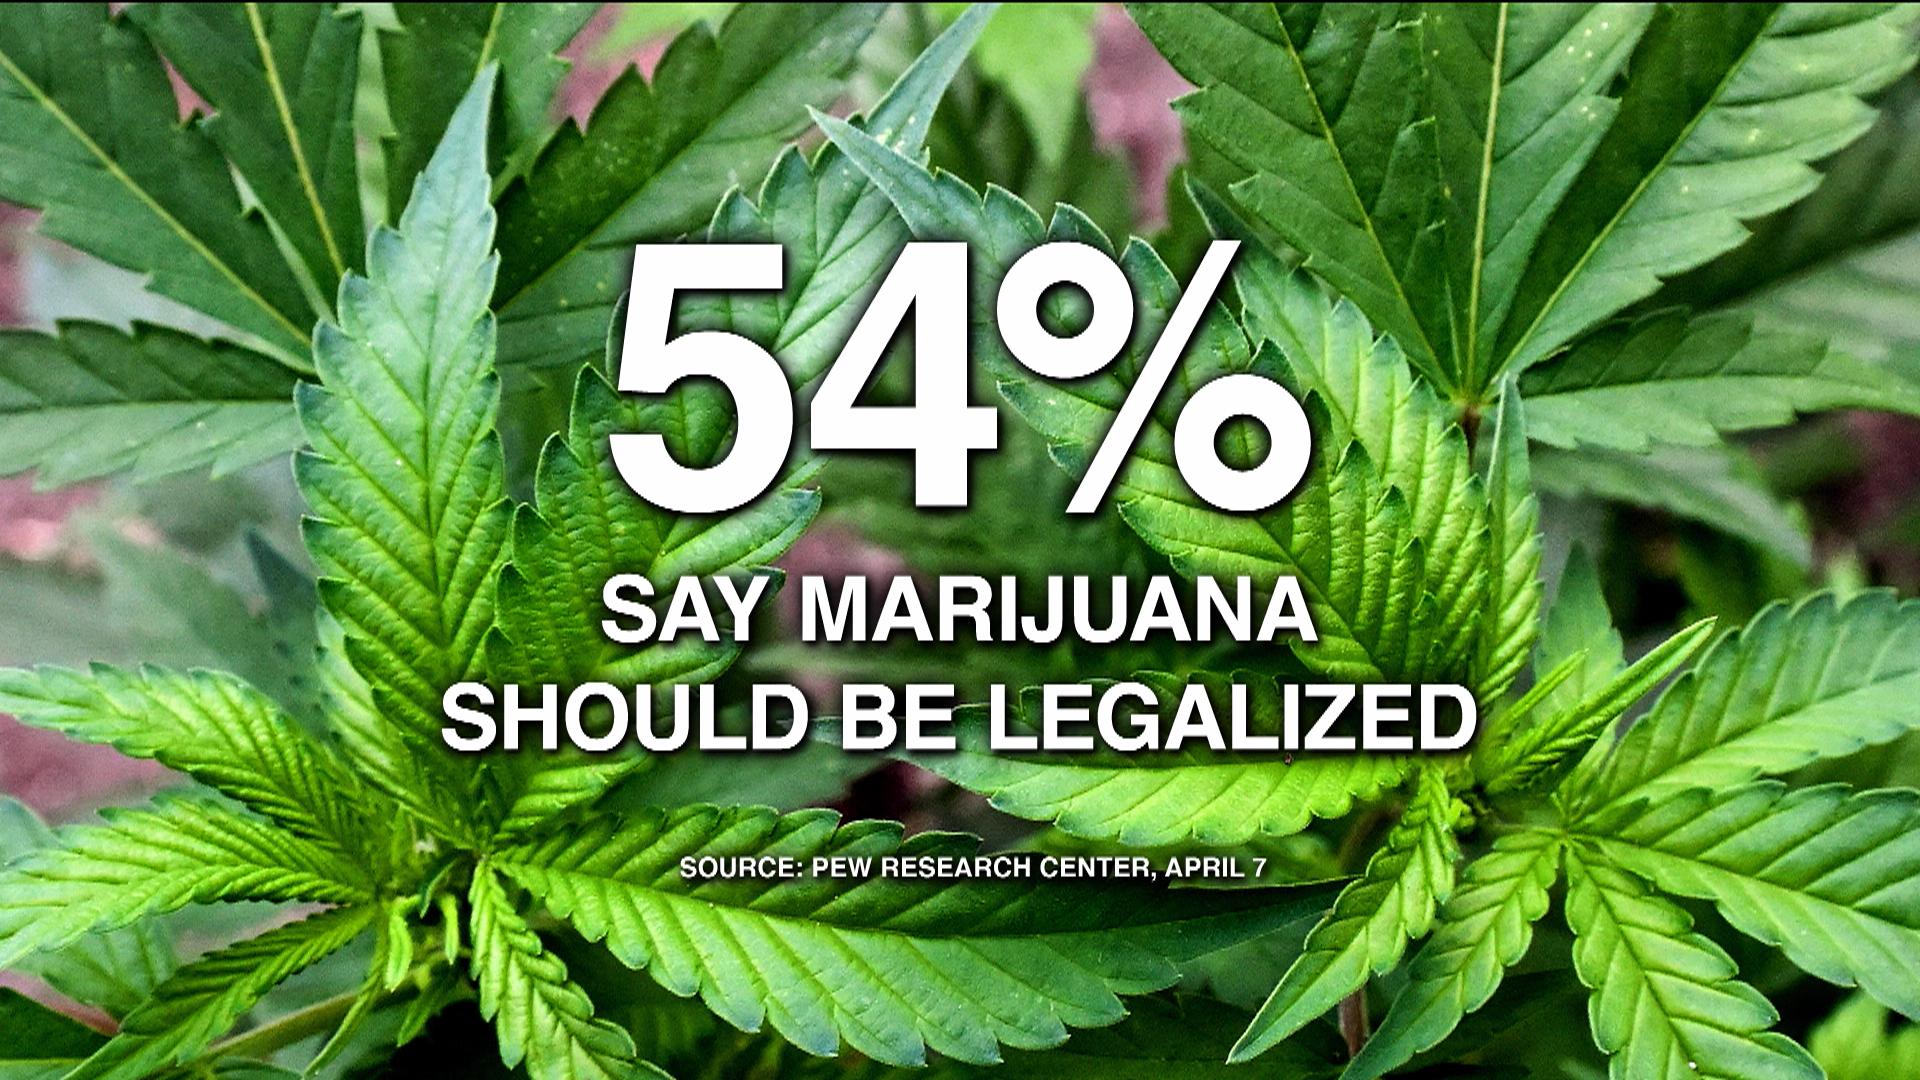 Fox News' beef with marijuana